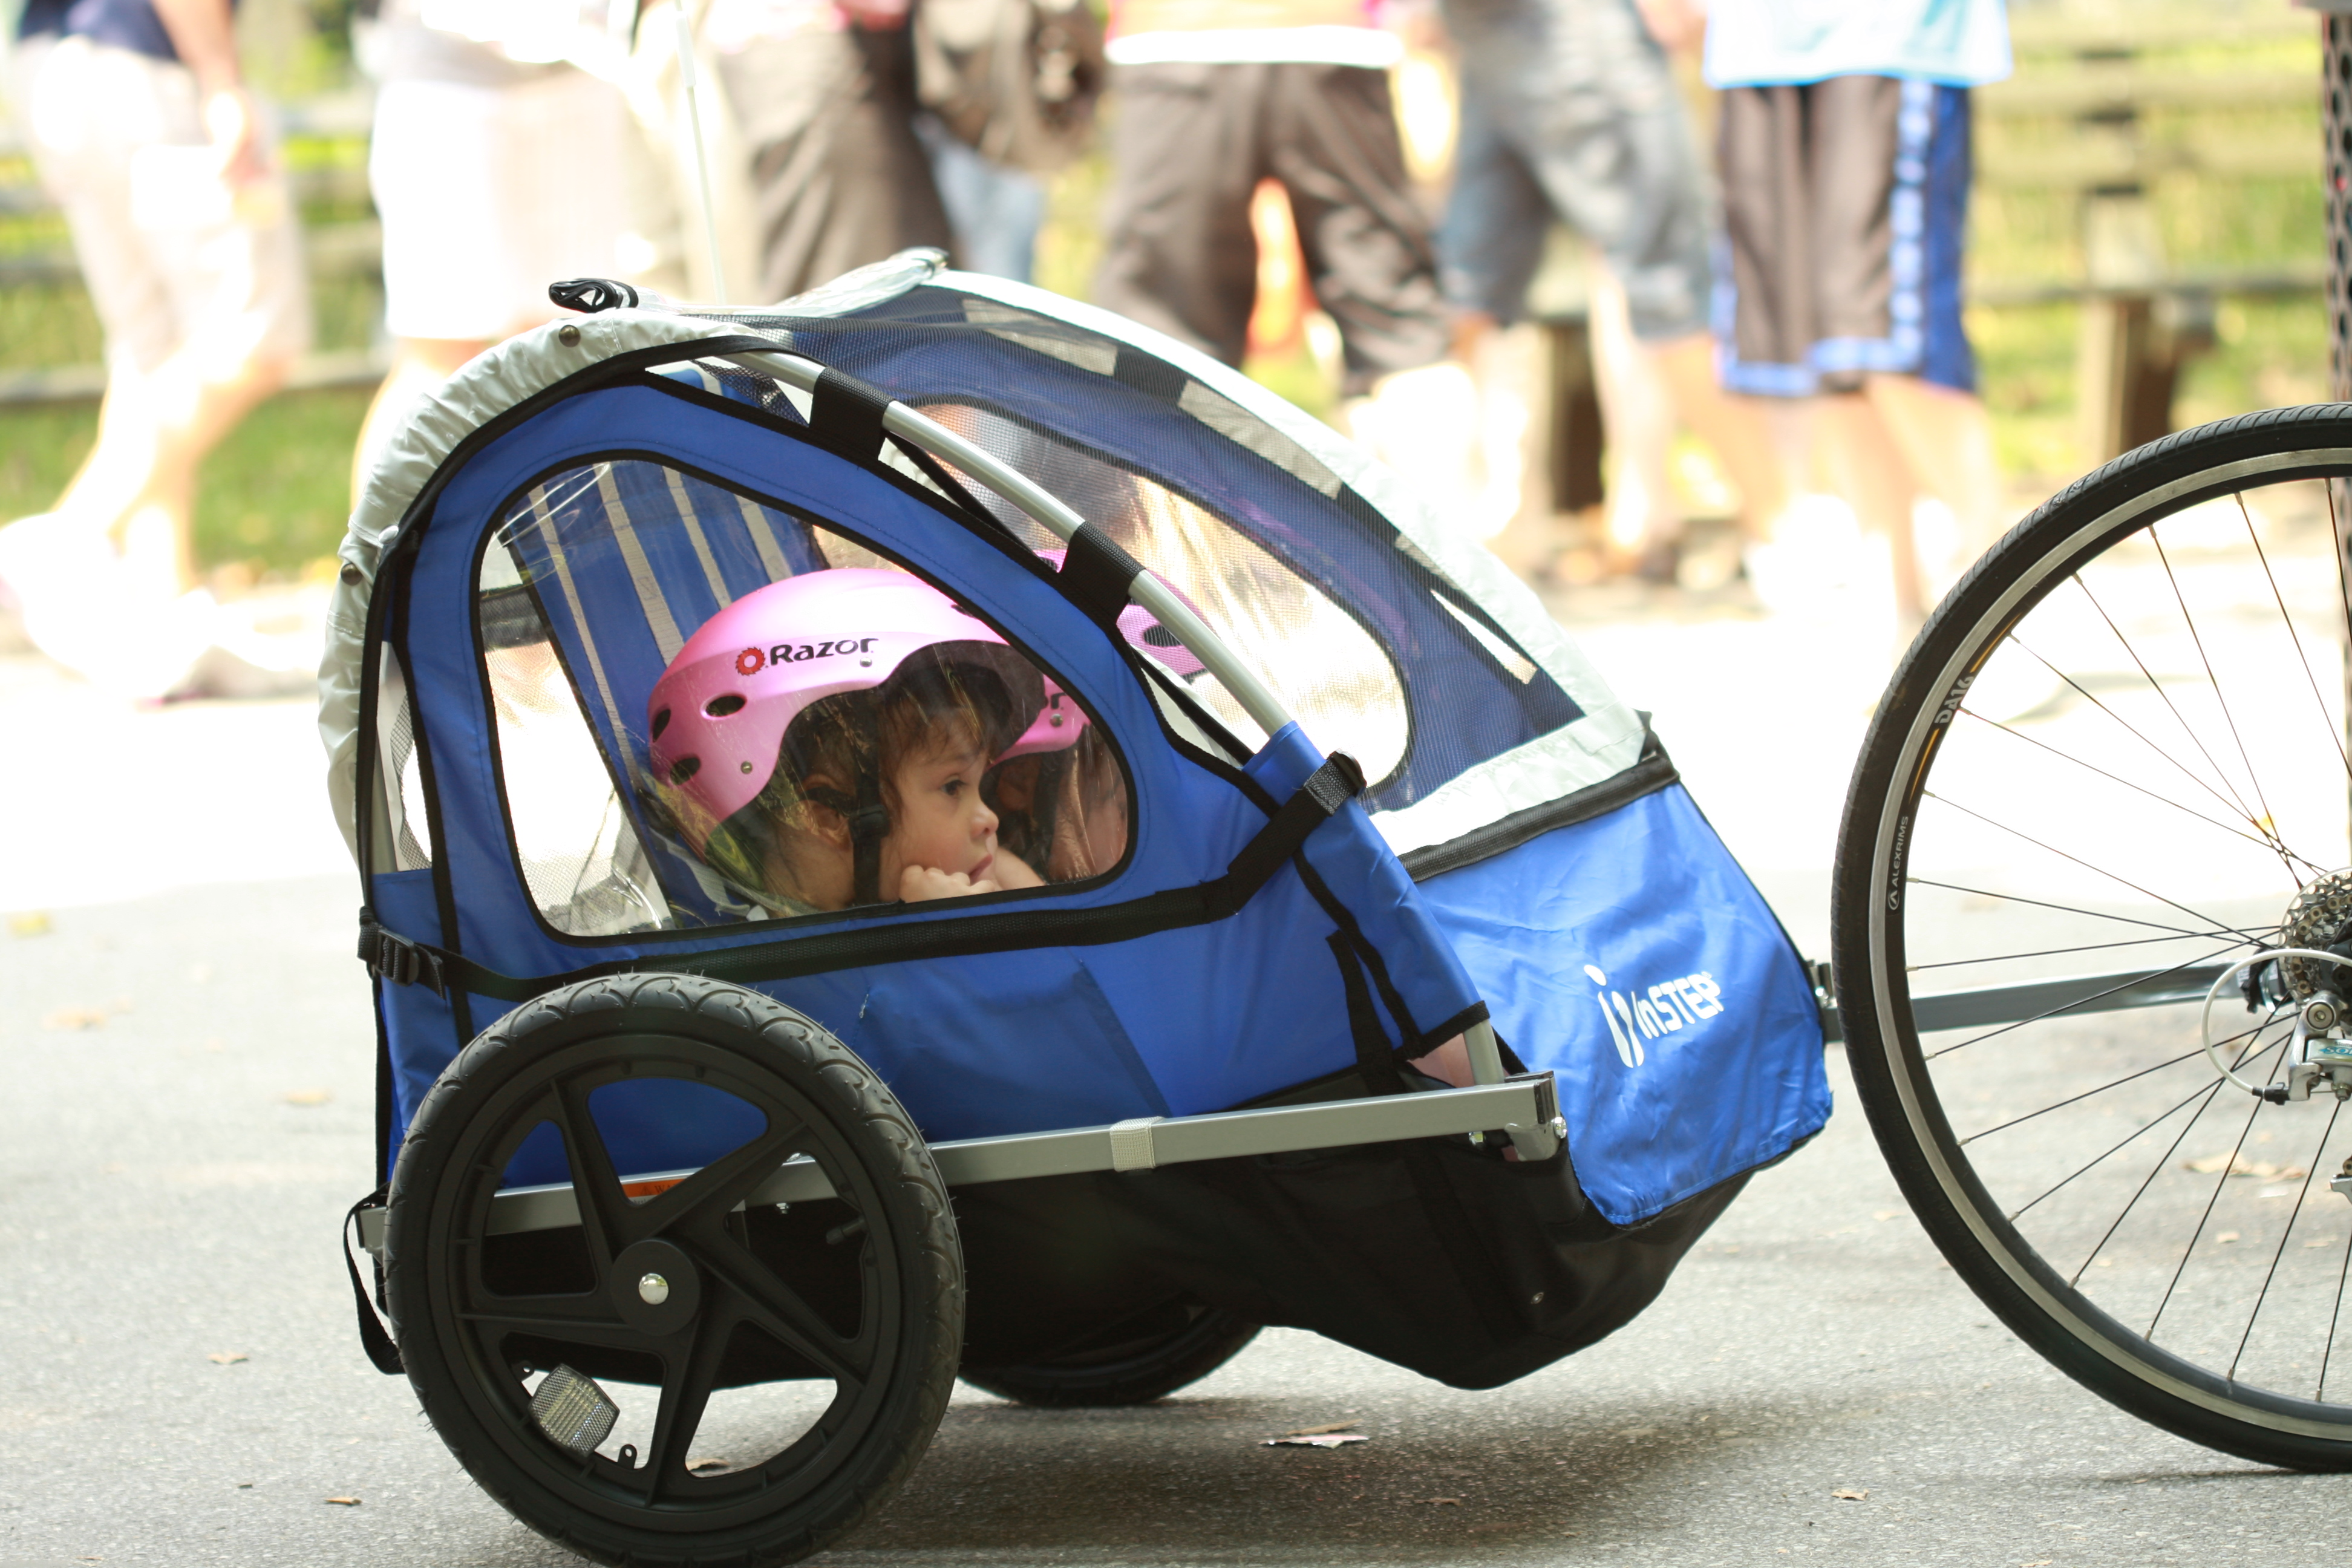 Children in a bike trailer